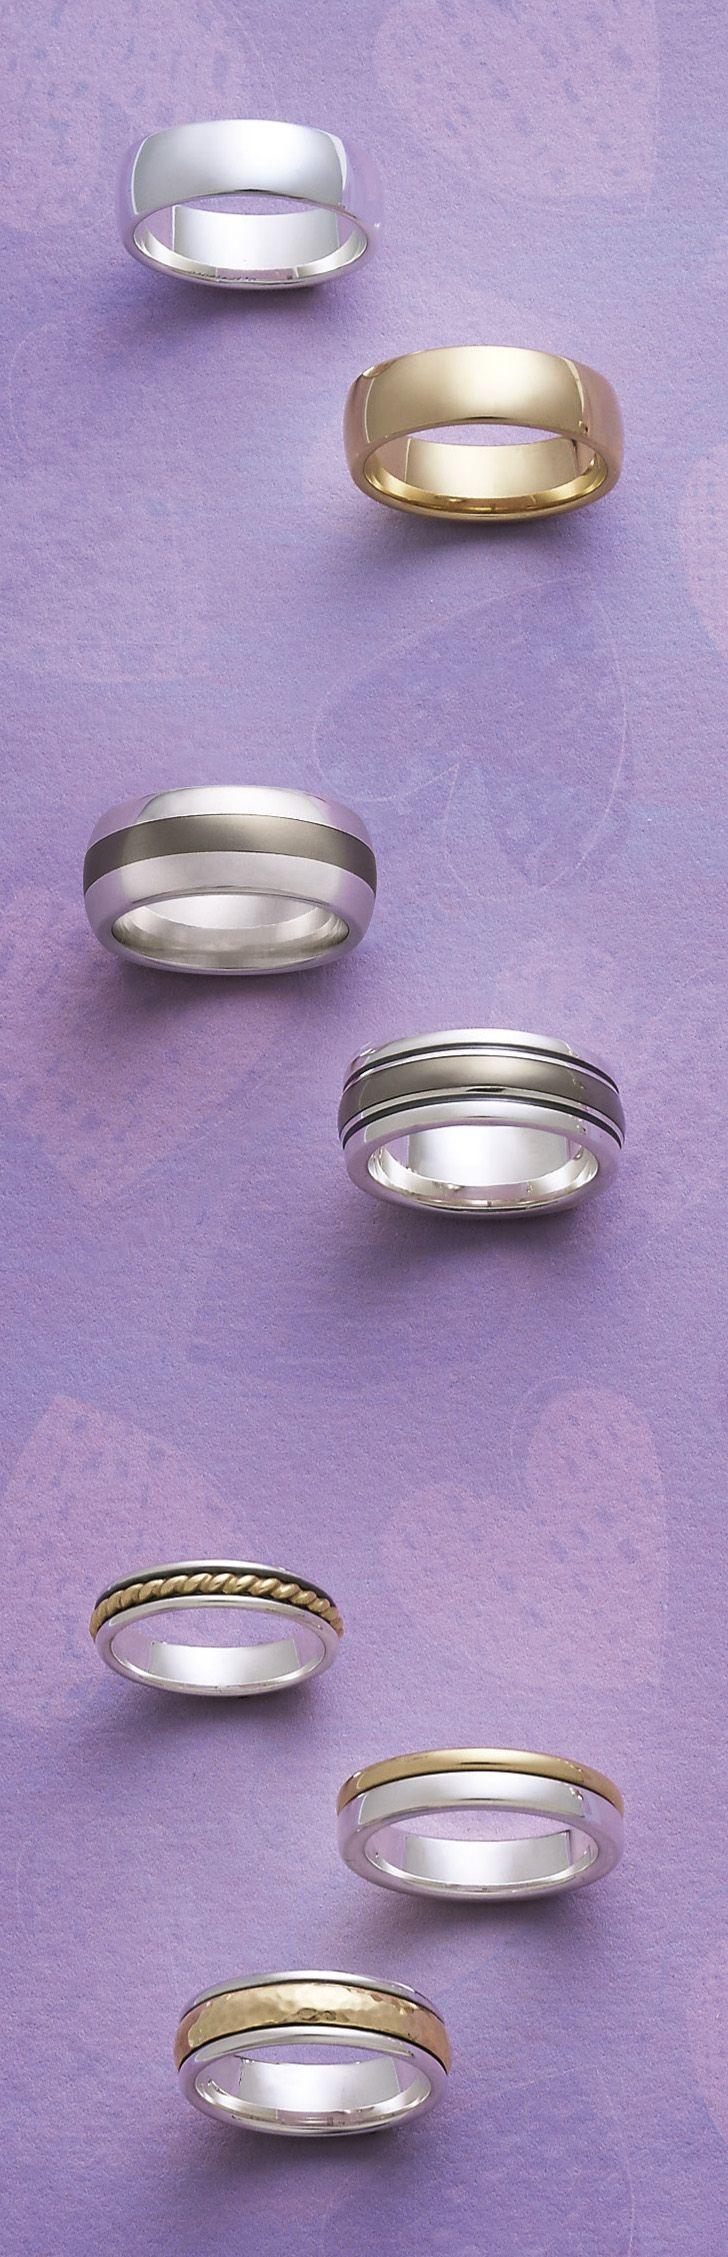 james avery wedding bands jamesavery - James Avery Wedding Rings